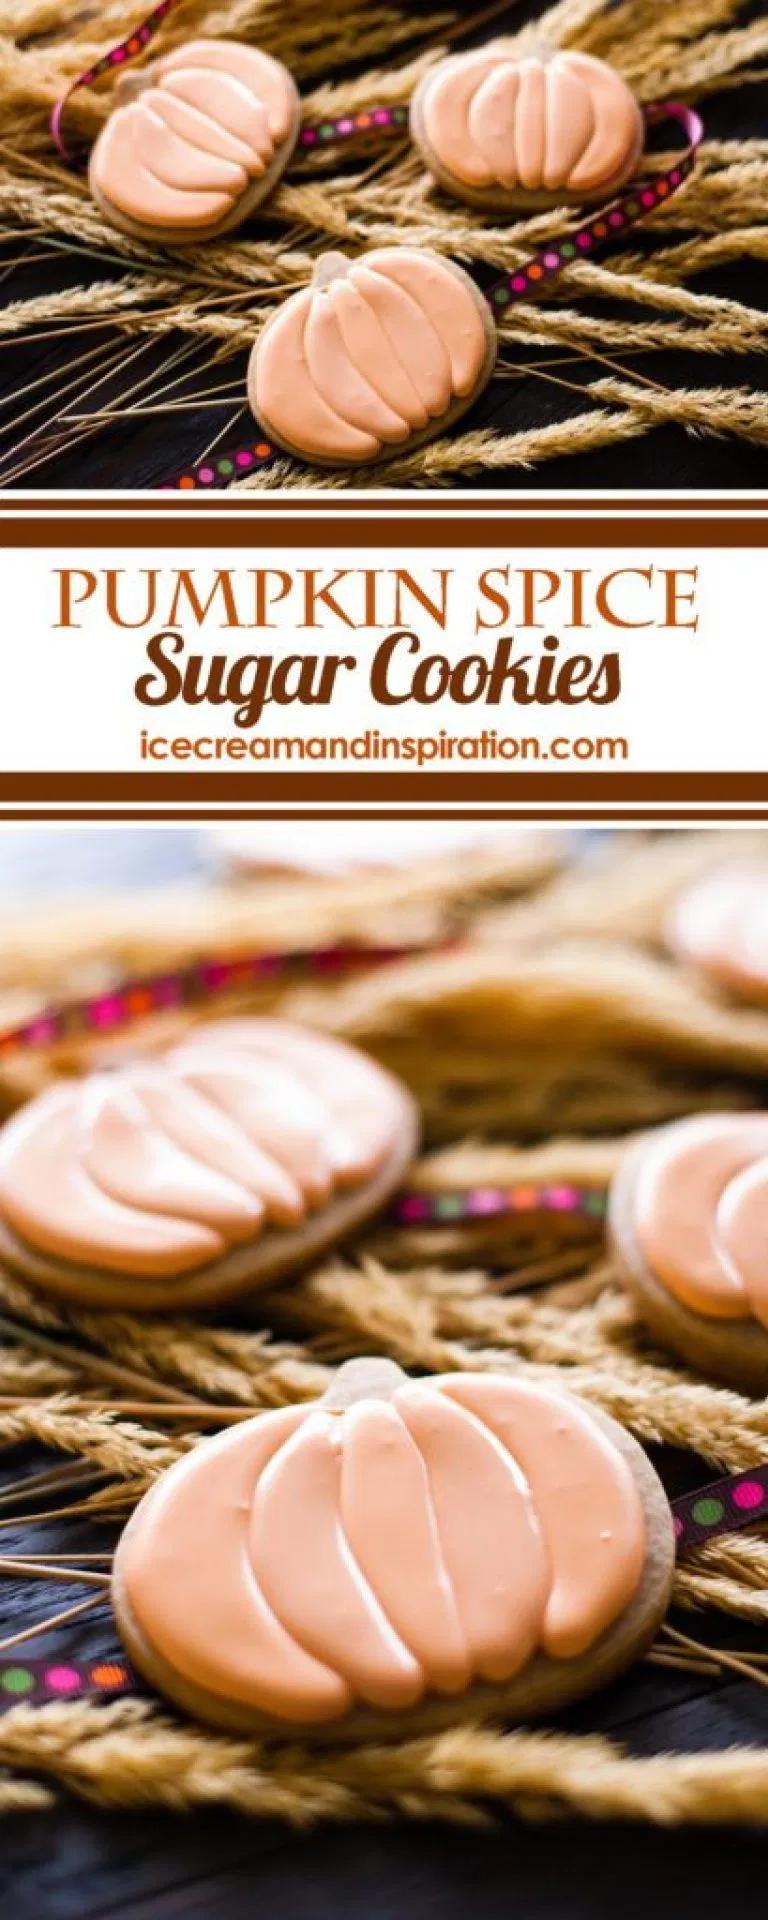 Pumpkin Spice Sugar Cookies - Beautiful Life and Home #pumpkinsugarcookies